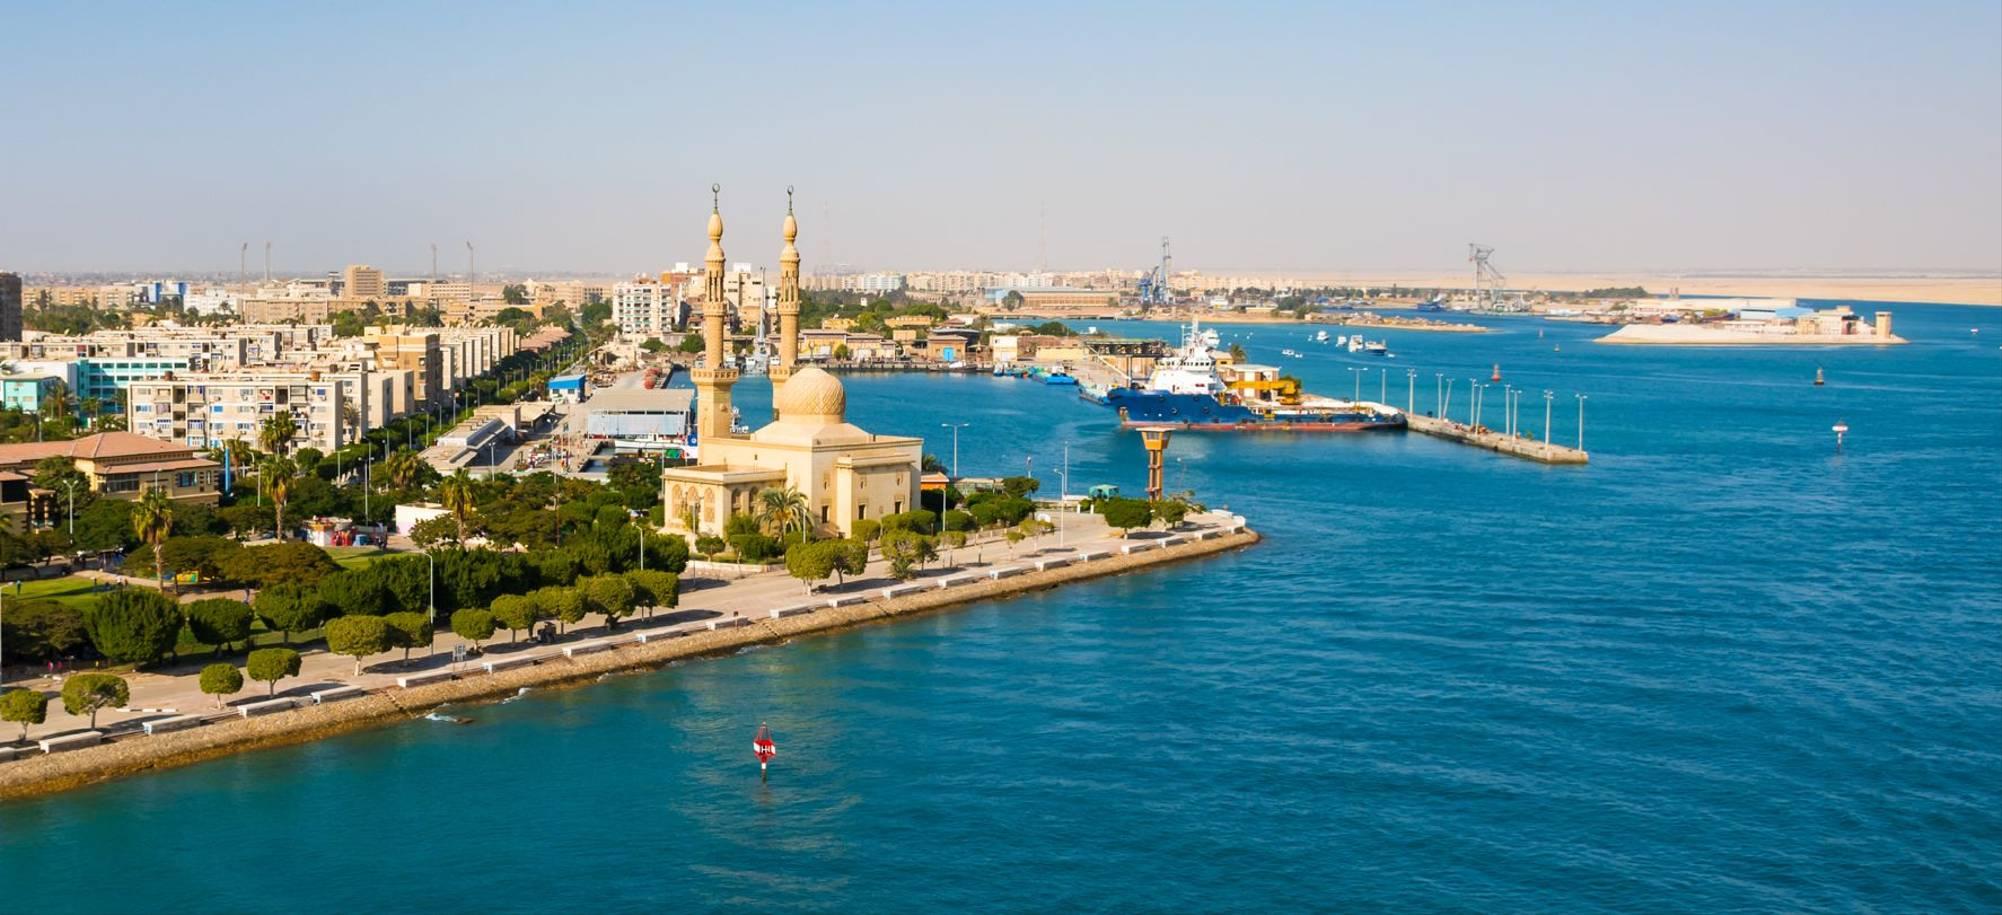 Suez Canal - Passing Port Said - Itinerary Desktop.jpg